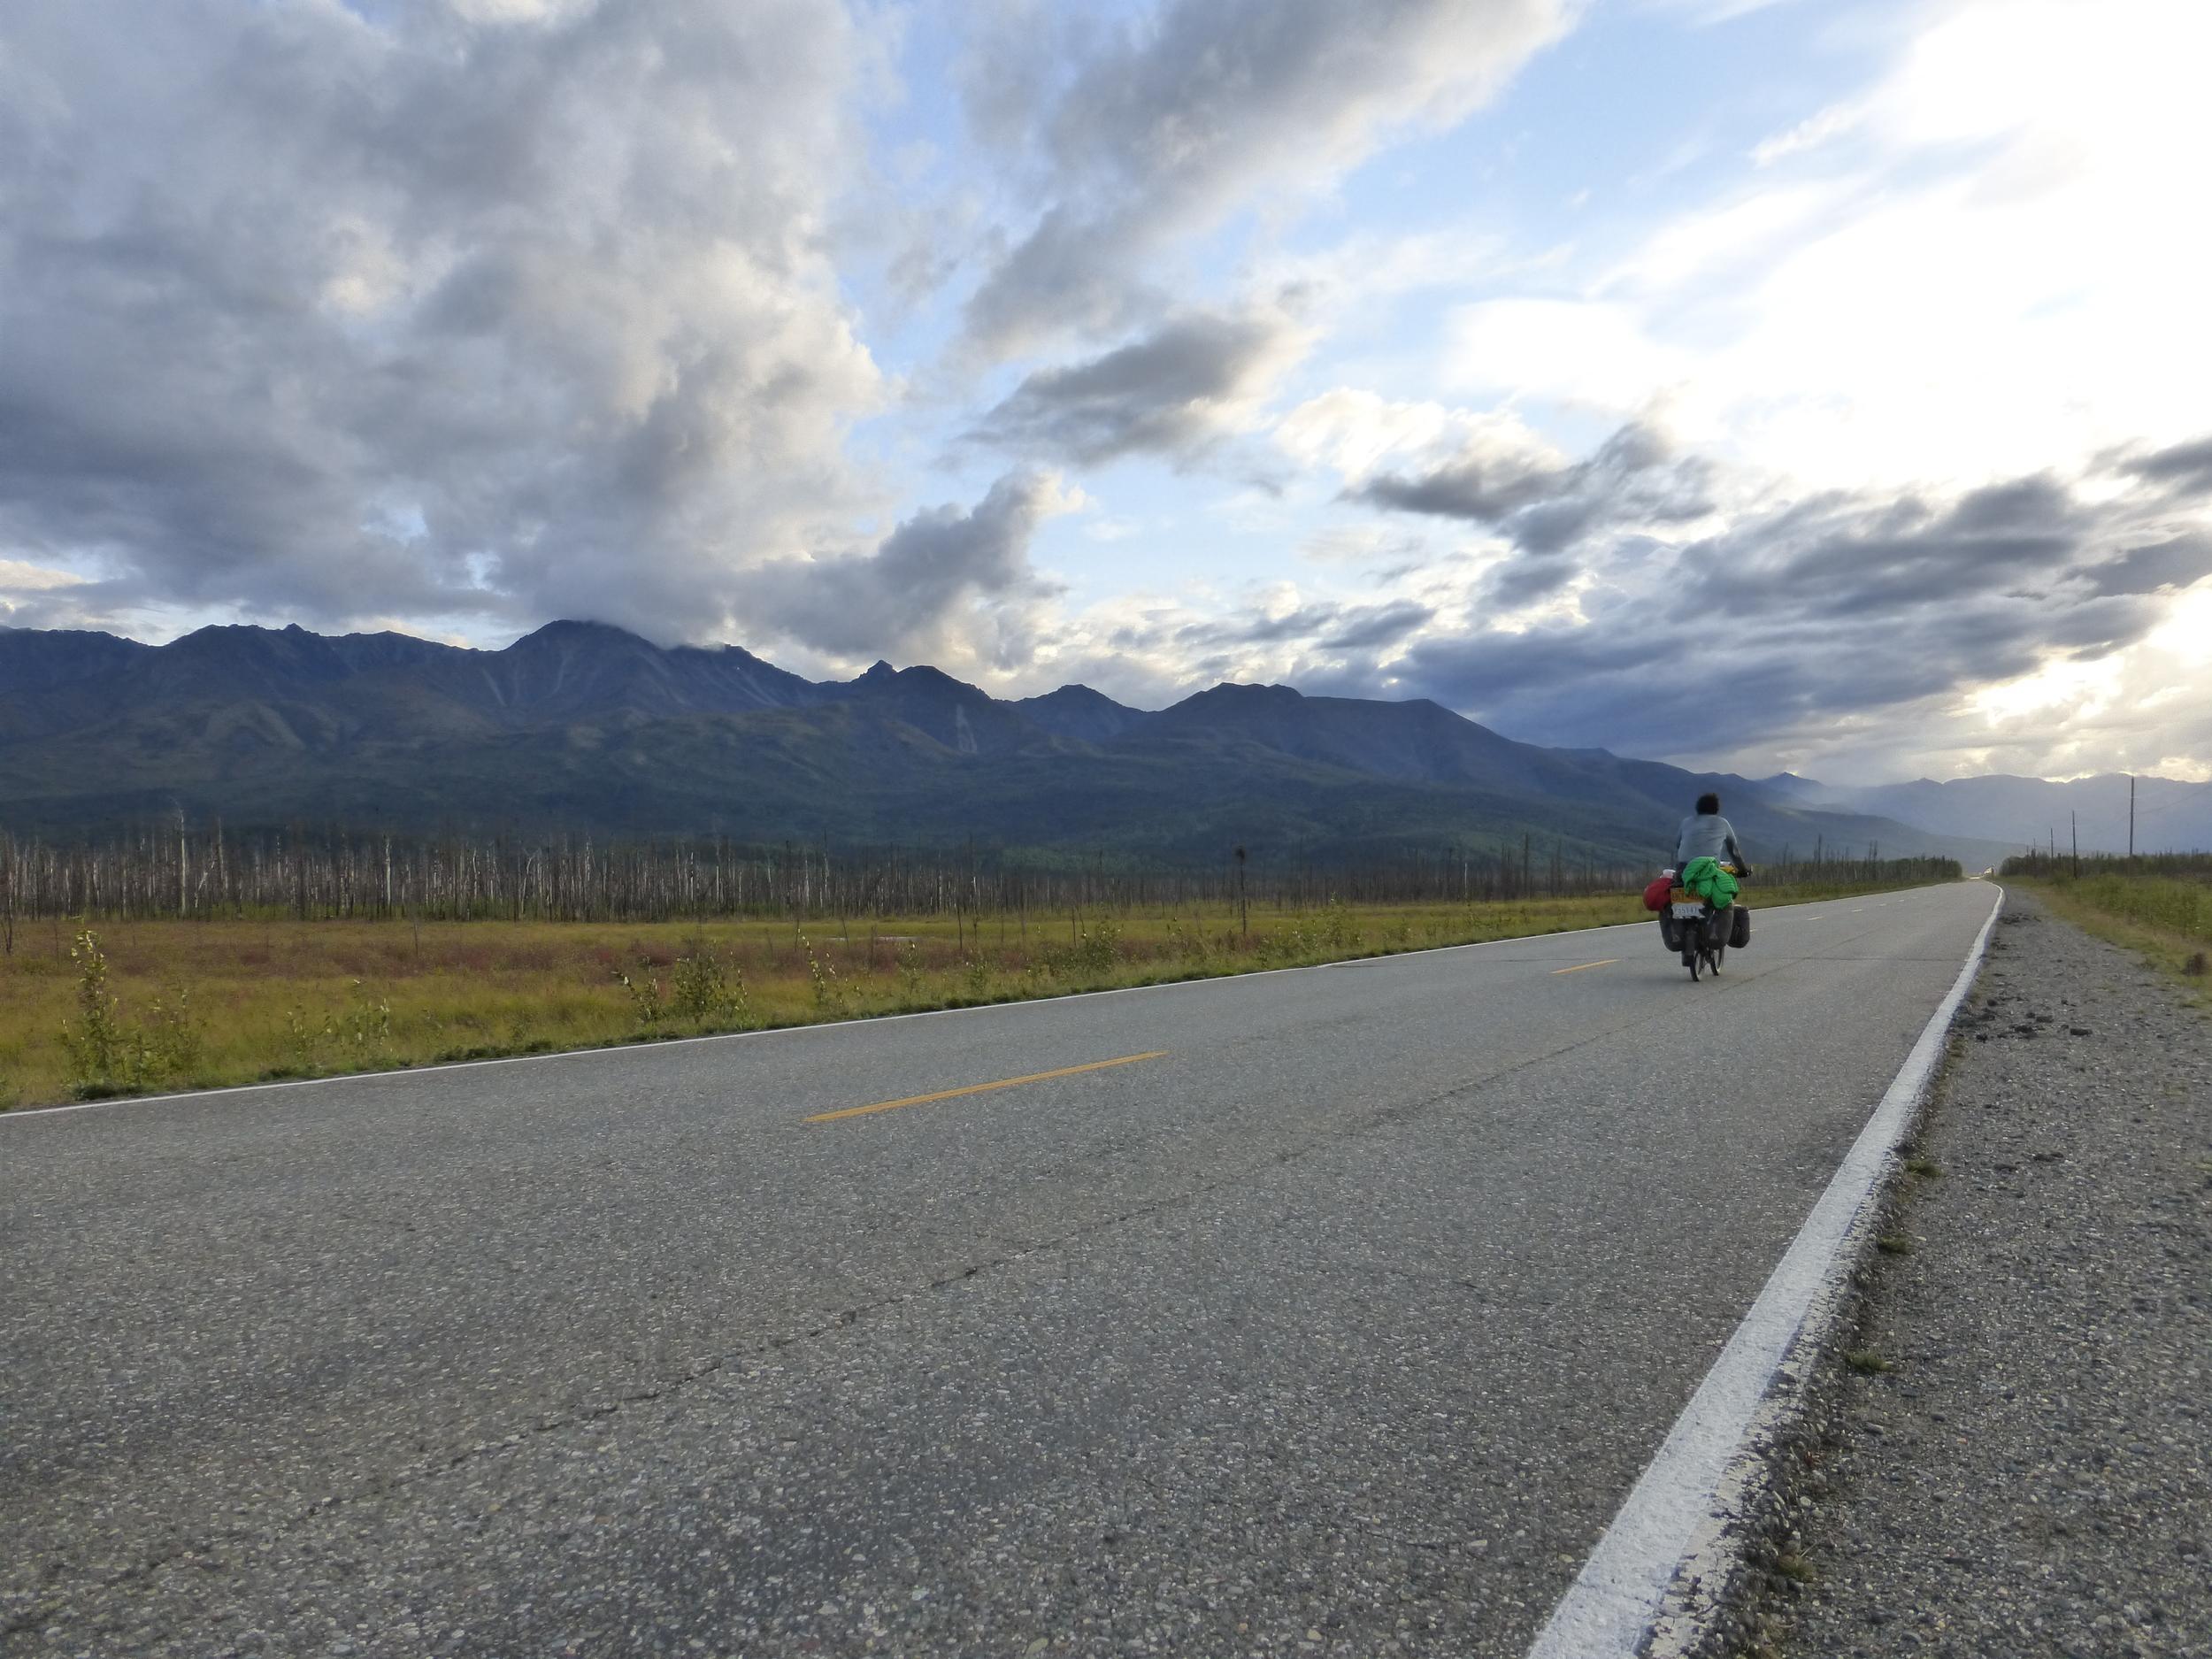 4. Alaska Highway